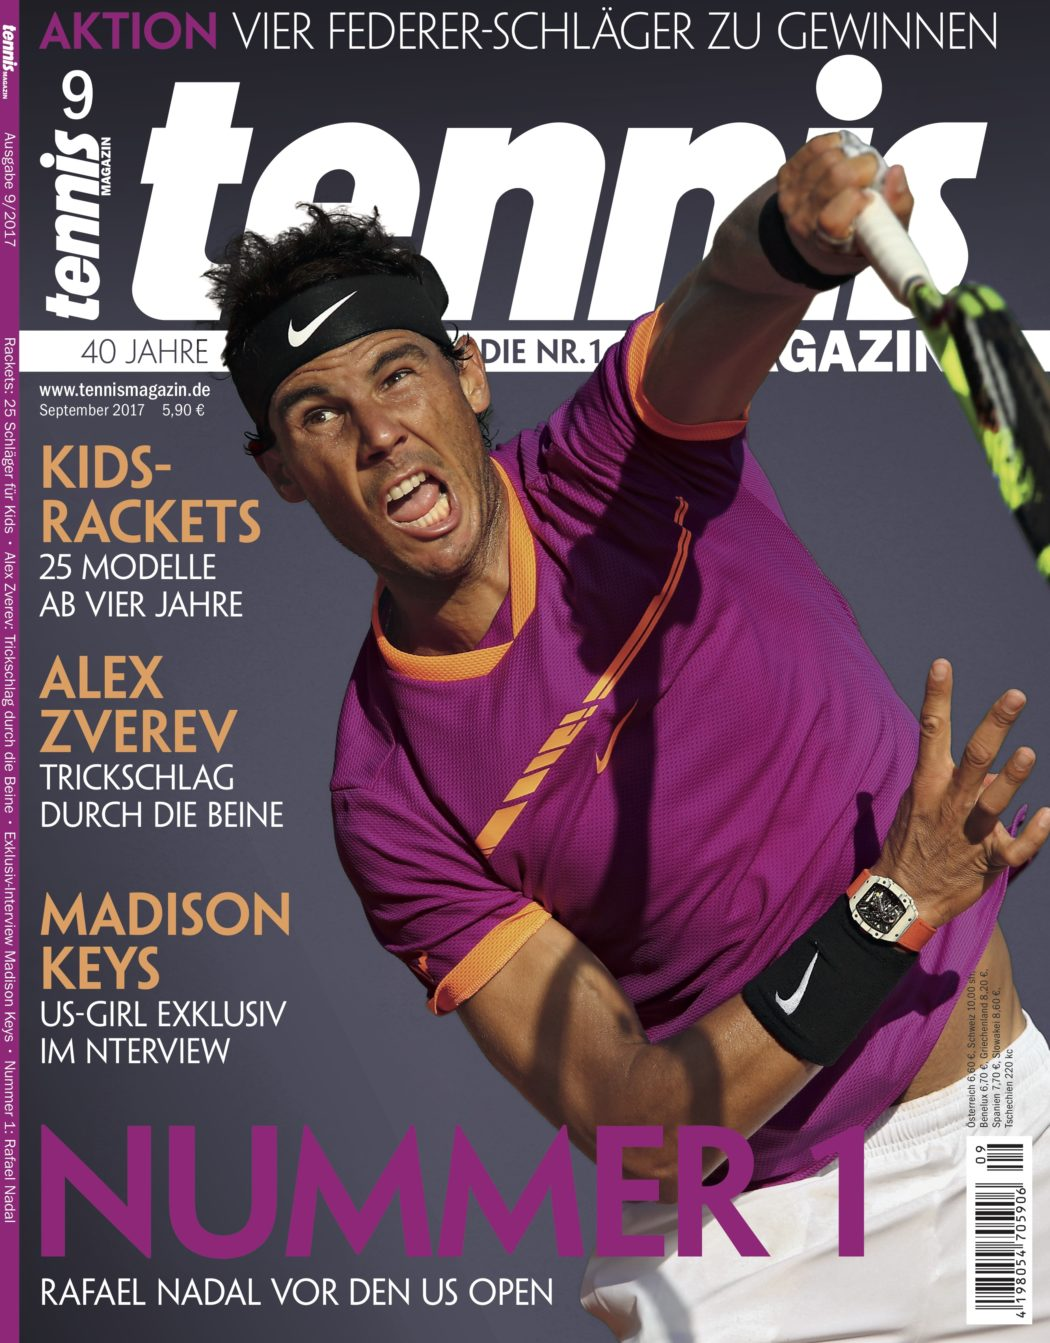 tennis Magazin 9/2017: Nummer 1 – Rafael Nadal vor den US Open